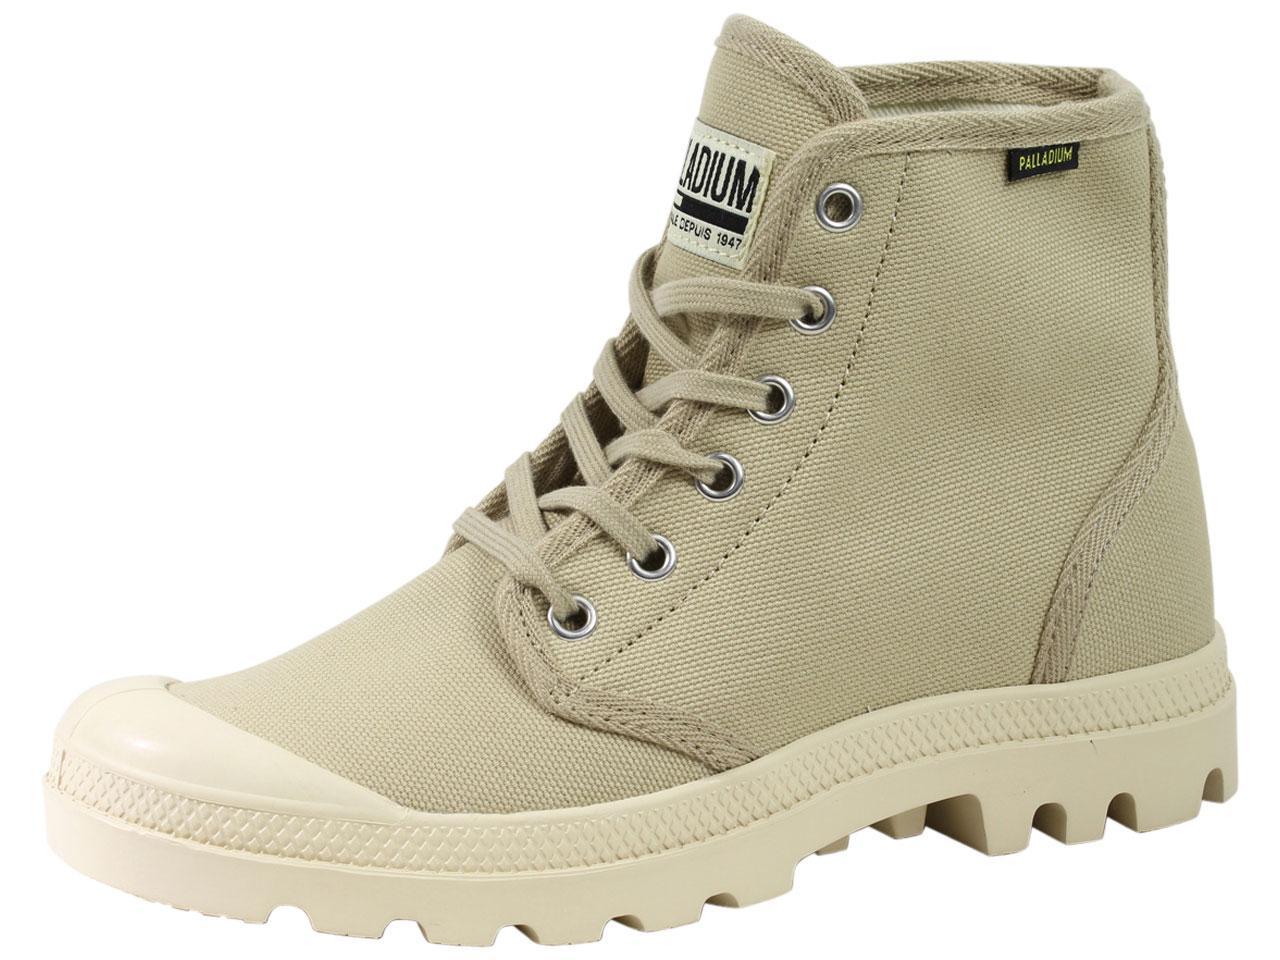 Image of Palladium Men's Pampa Hi Originale Chukka Boots Shoes - Beige - 6.5 D(M) US/8 B(M) US